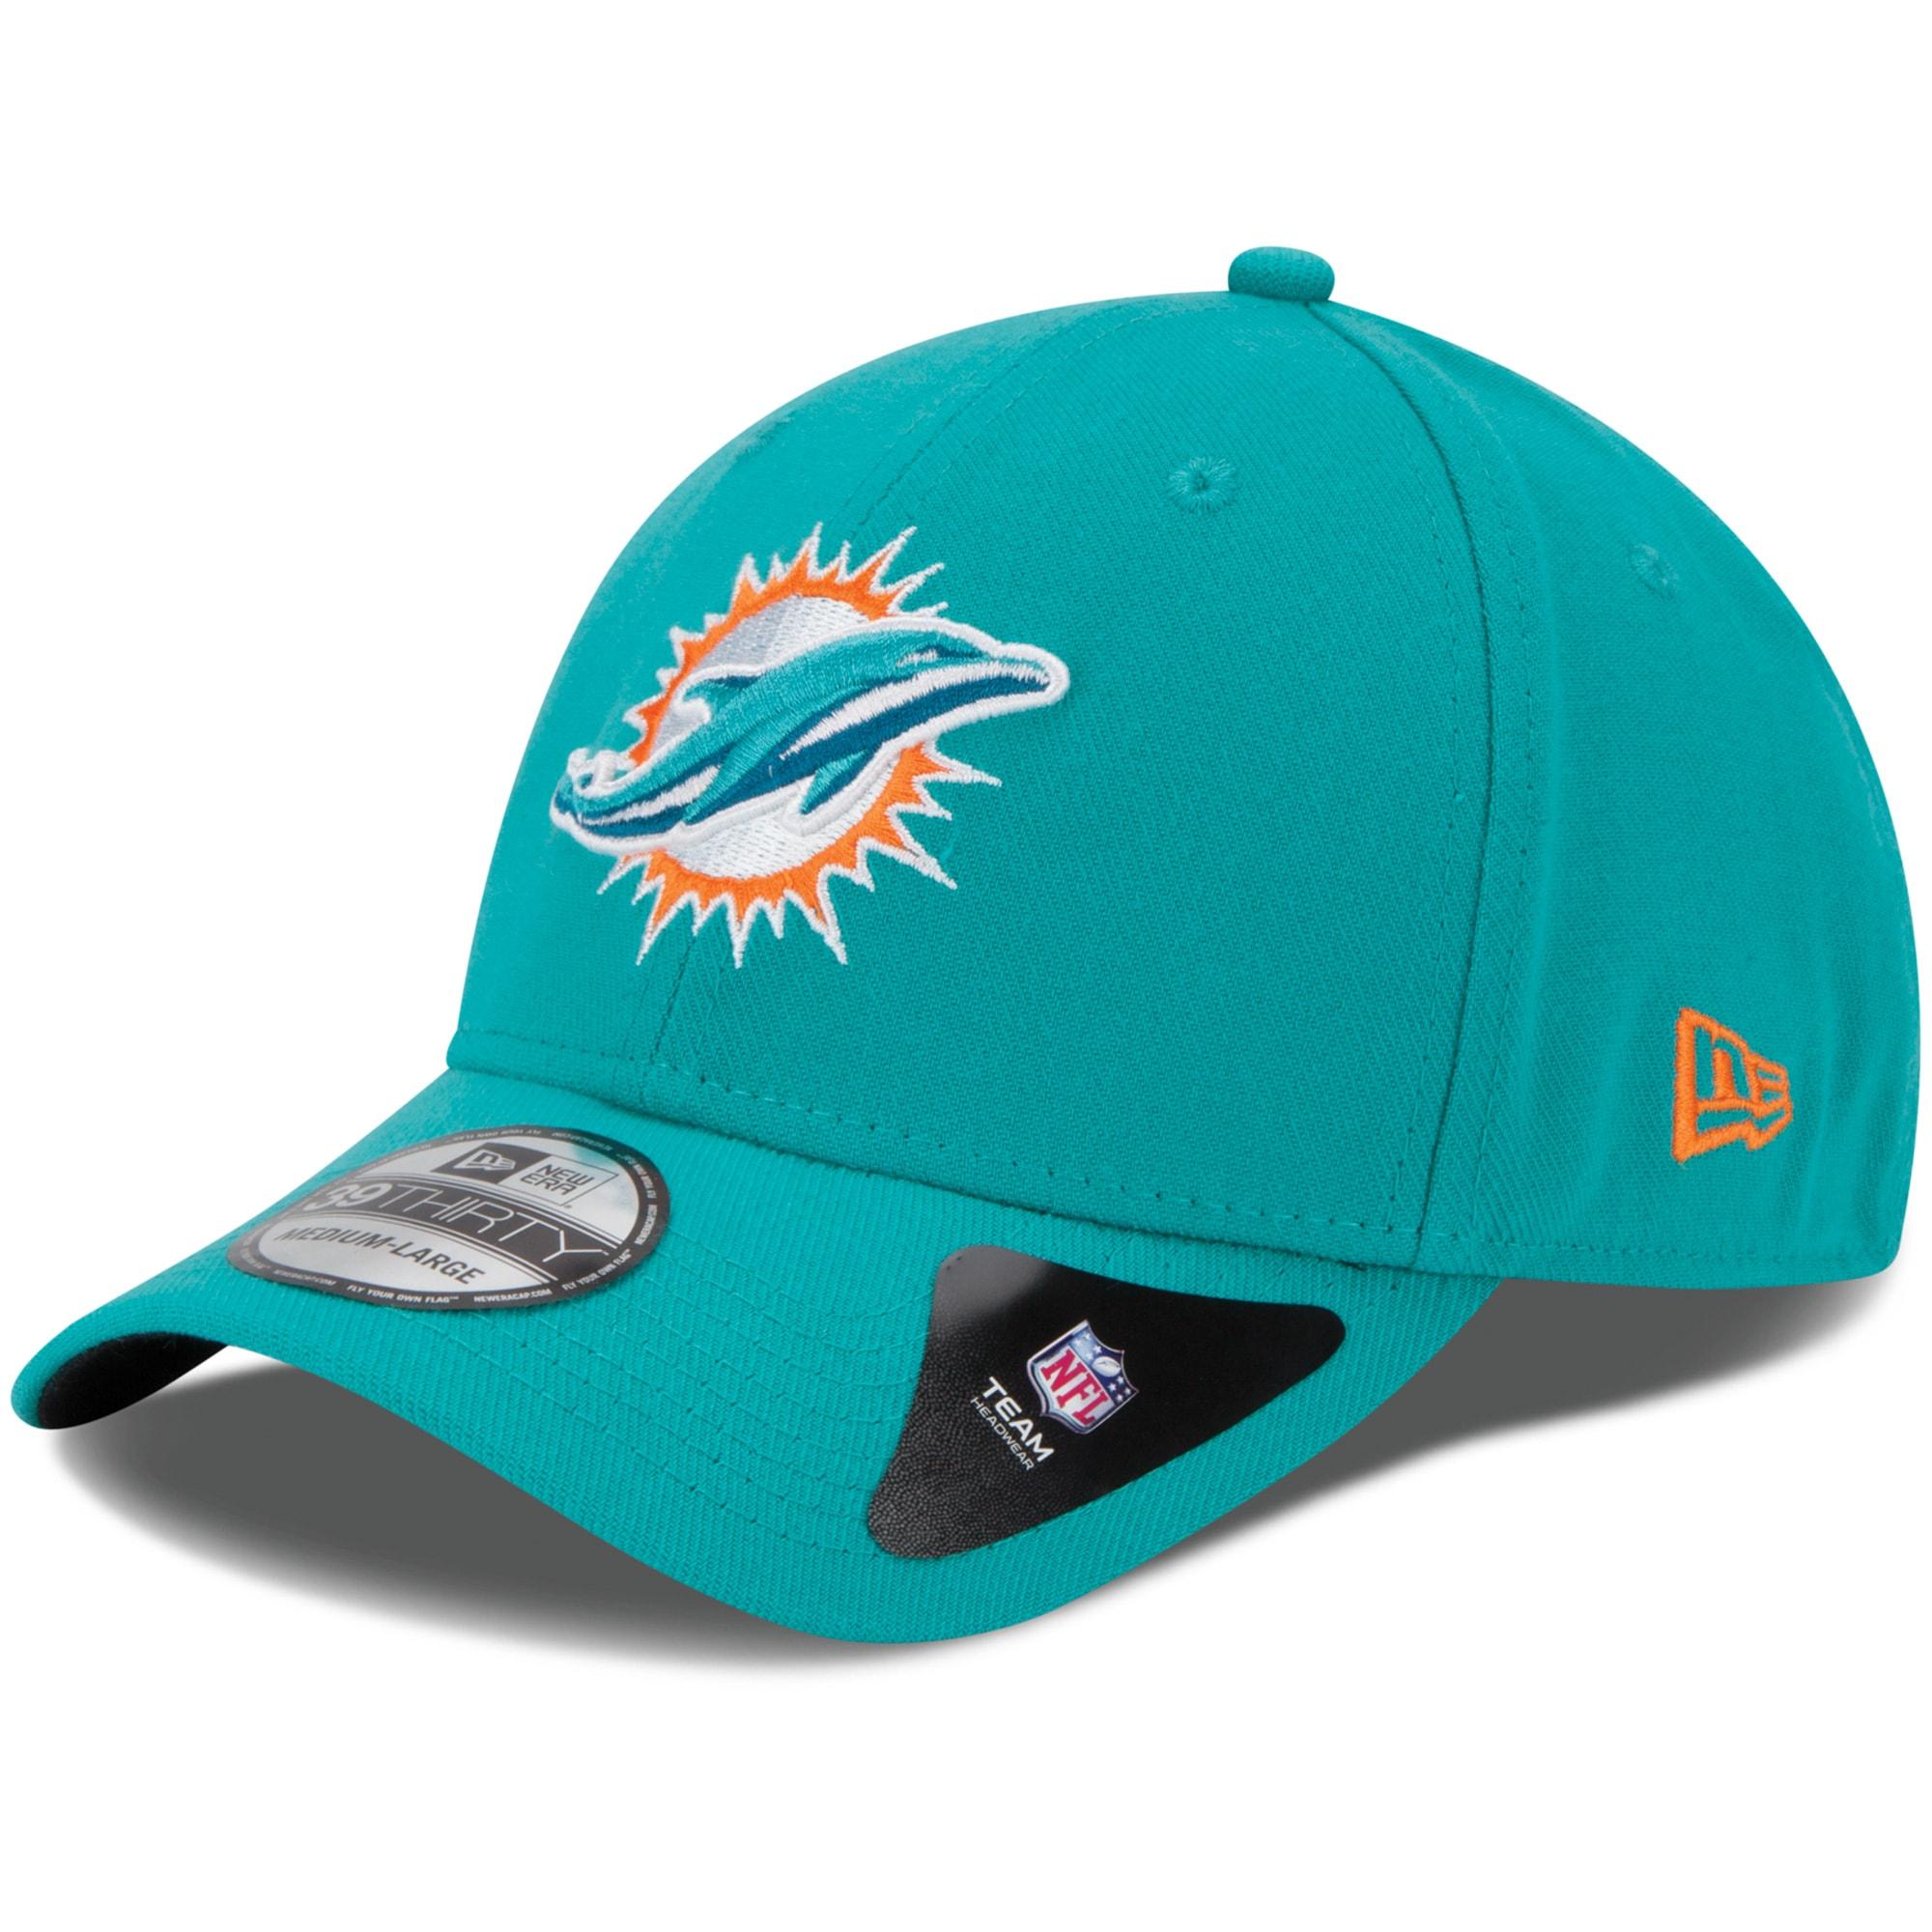 Miami Dolphins New Era Youth Team Classic 39THIRTY Flex Hat - Aqua